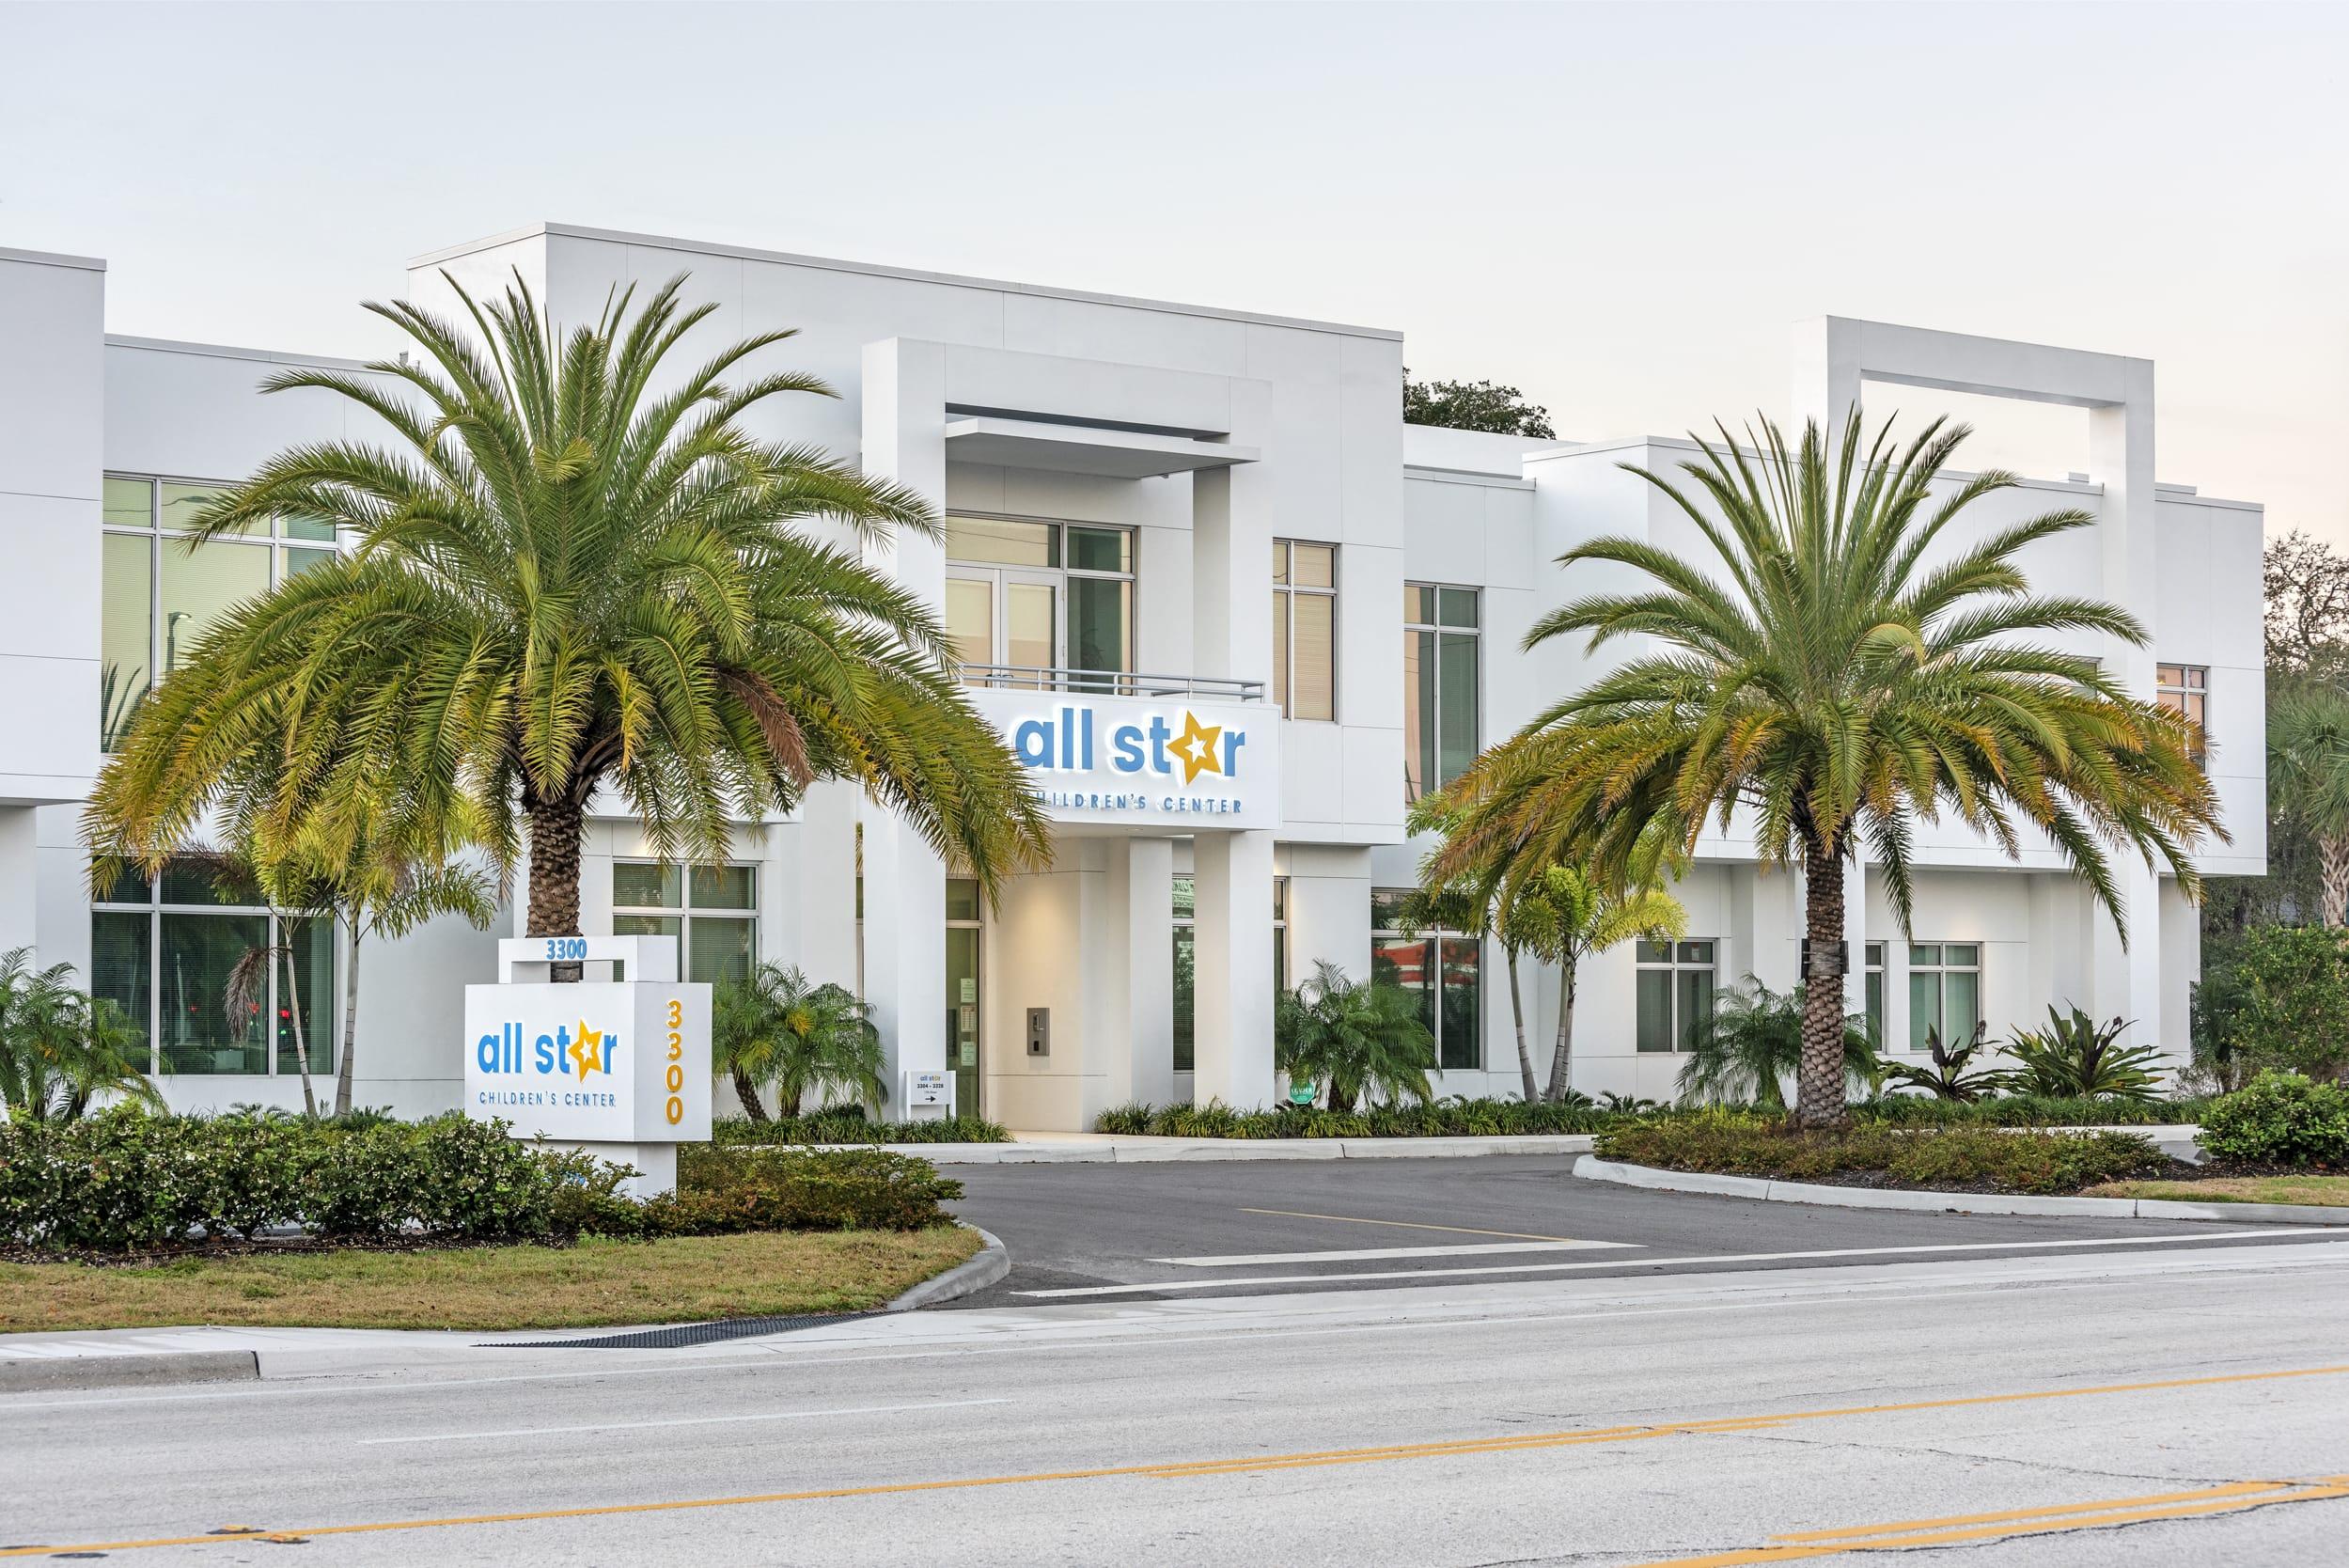 Exterior All Star Children's Center Palm Trees Crop